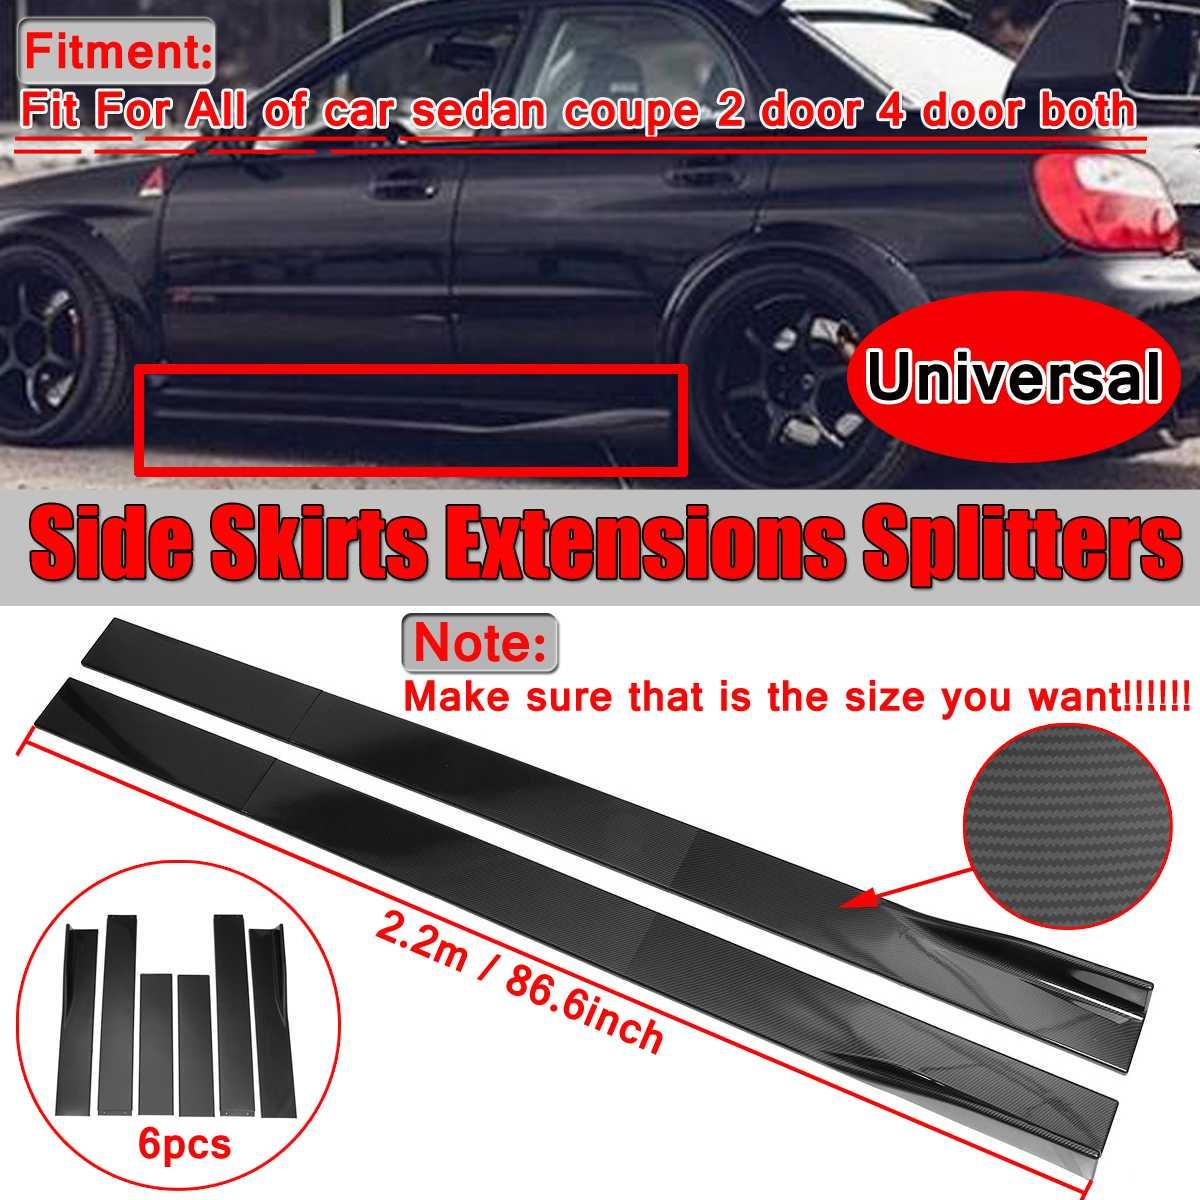 6PCS פחמן מראה/שחור 2 m/2.2 m אוניברסלי צד חצאית תוספות רכב צד חצאיות נפון מפצלים שפתיים עבור BMW לנץ עבור הונדה